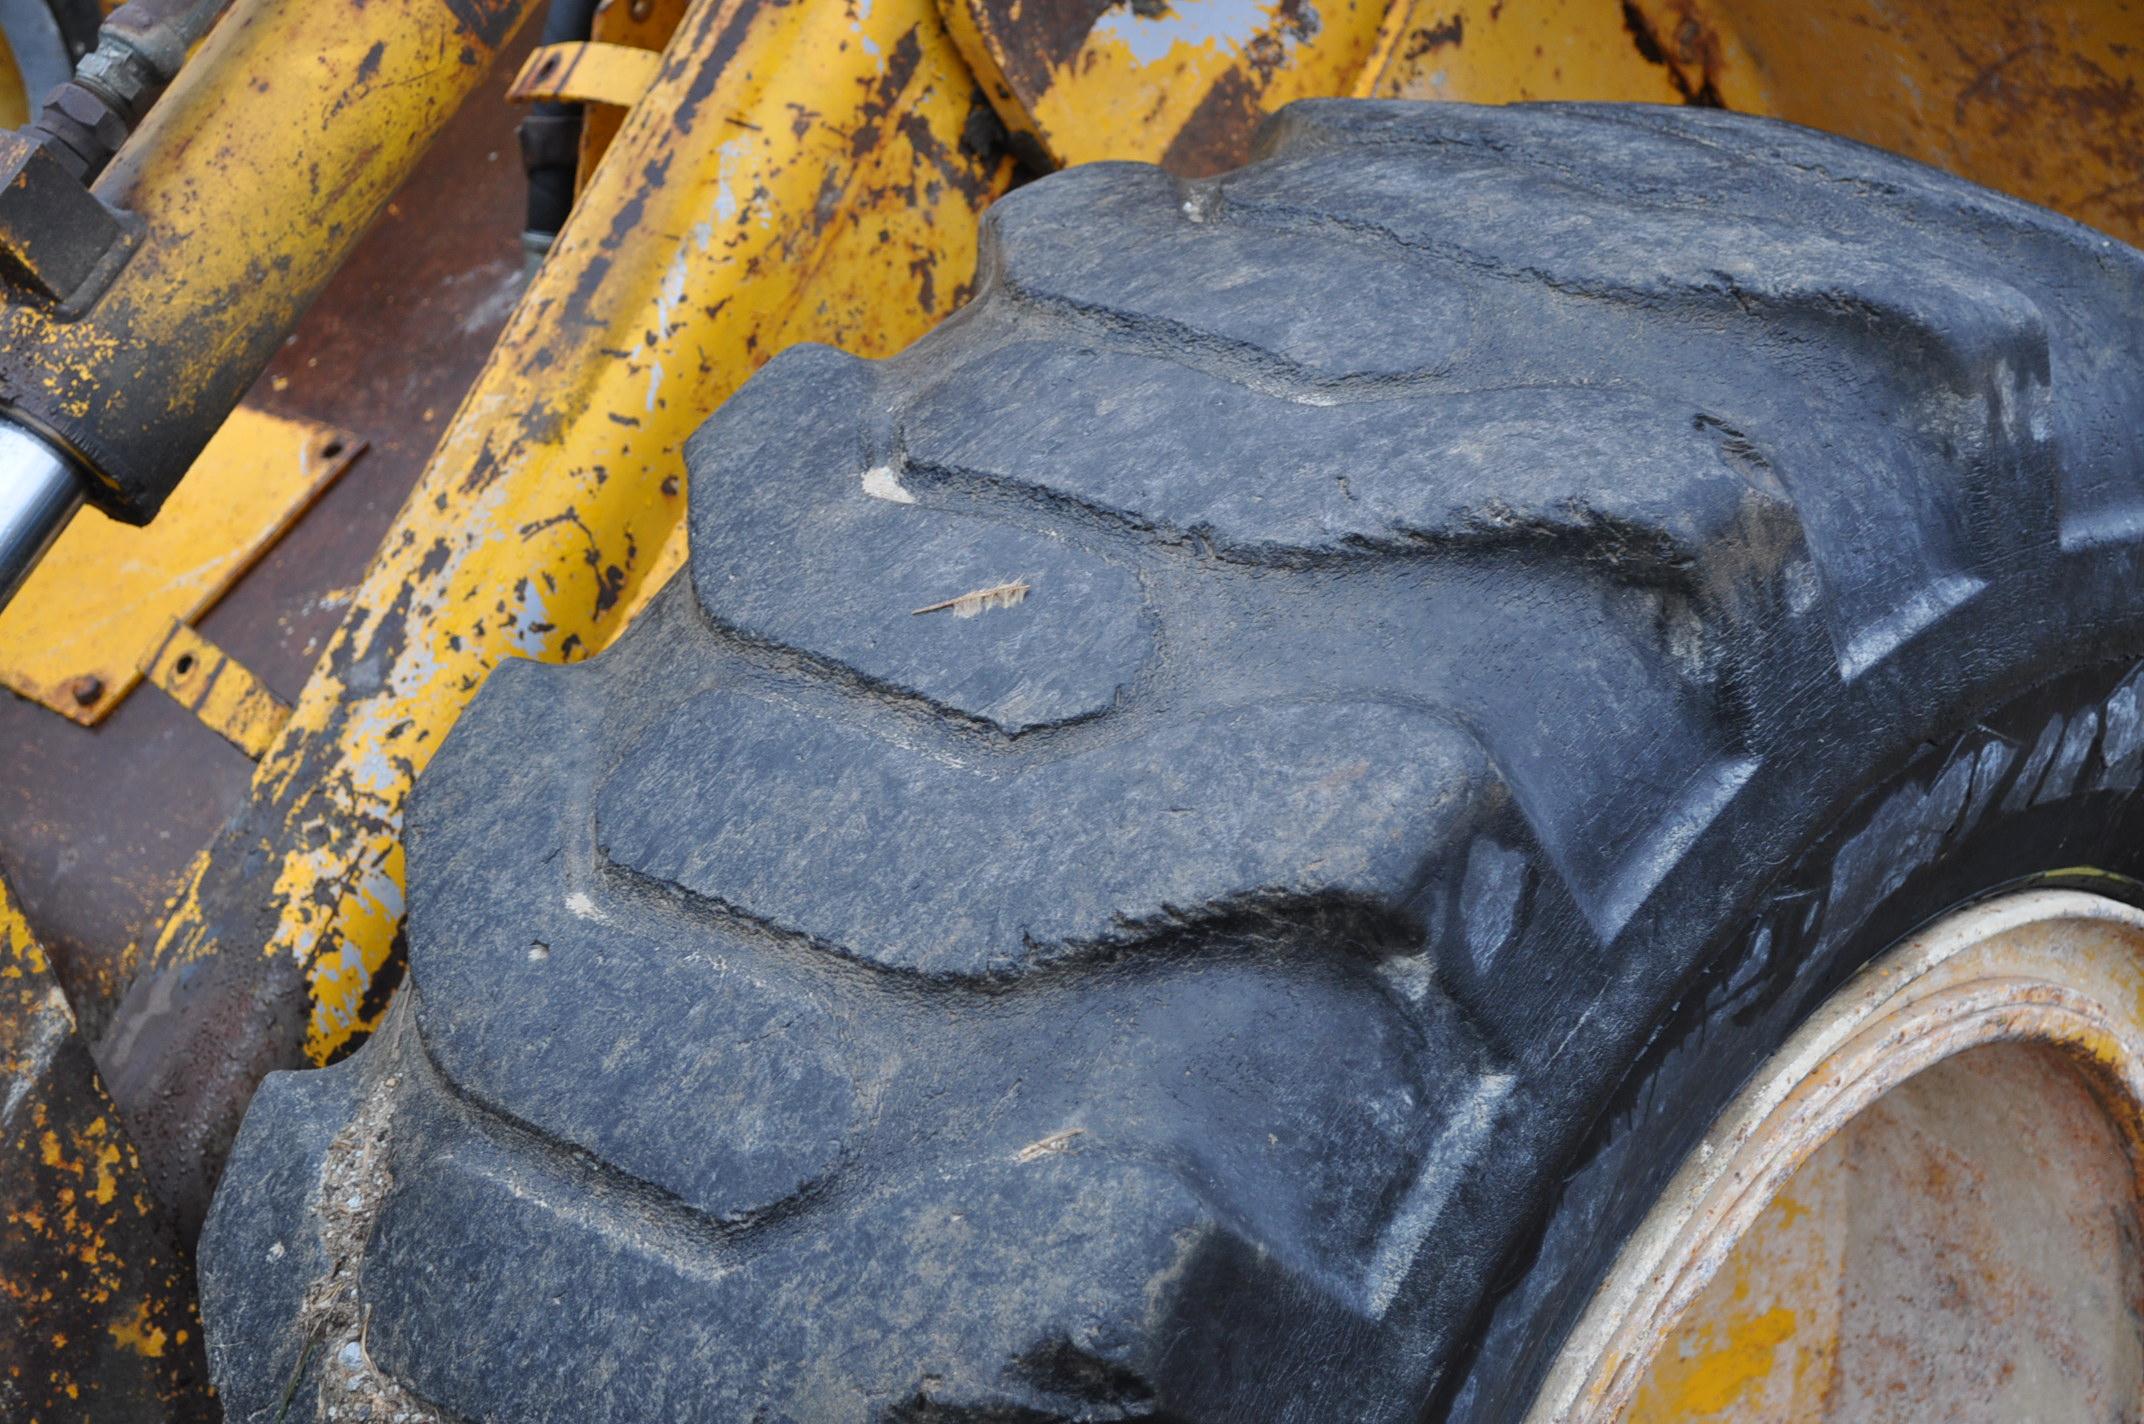 John Deere 544 Payloader, 17.5-25 tires, shows 1074 hrs, SN 0767621 - Image 6 of 16